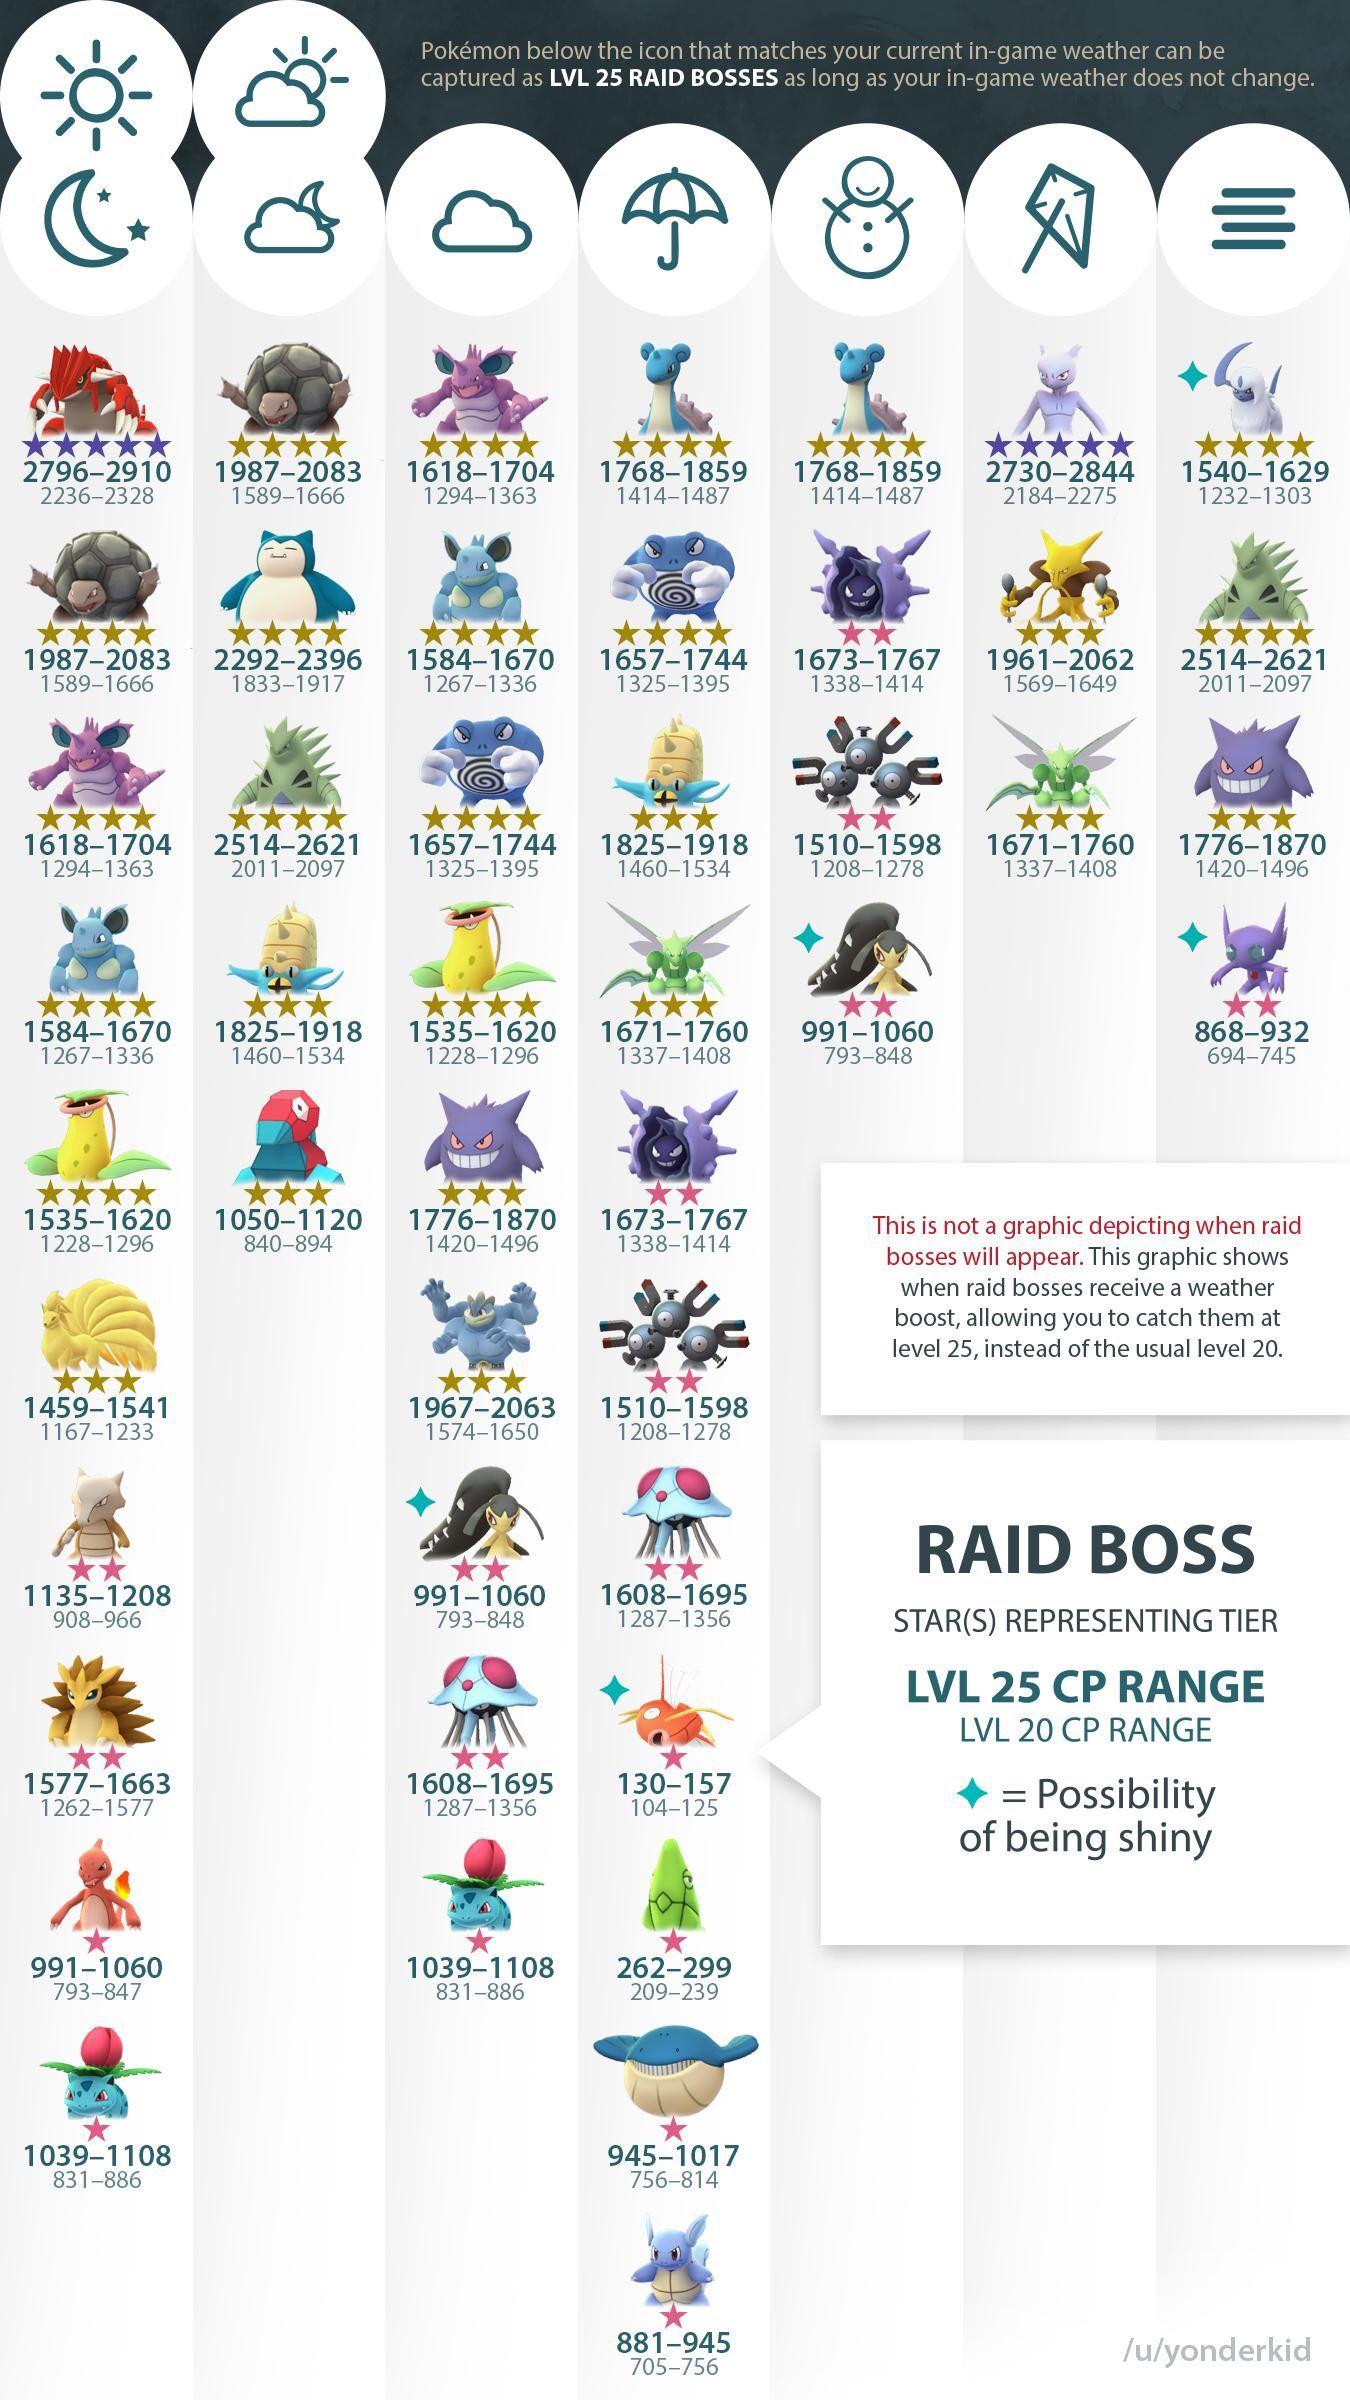 Pokemon Go Level 25 RAID Boss by Weather